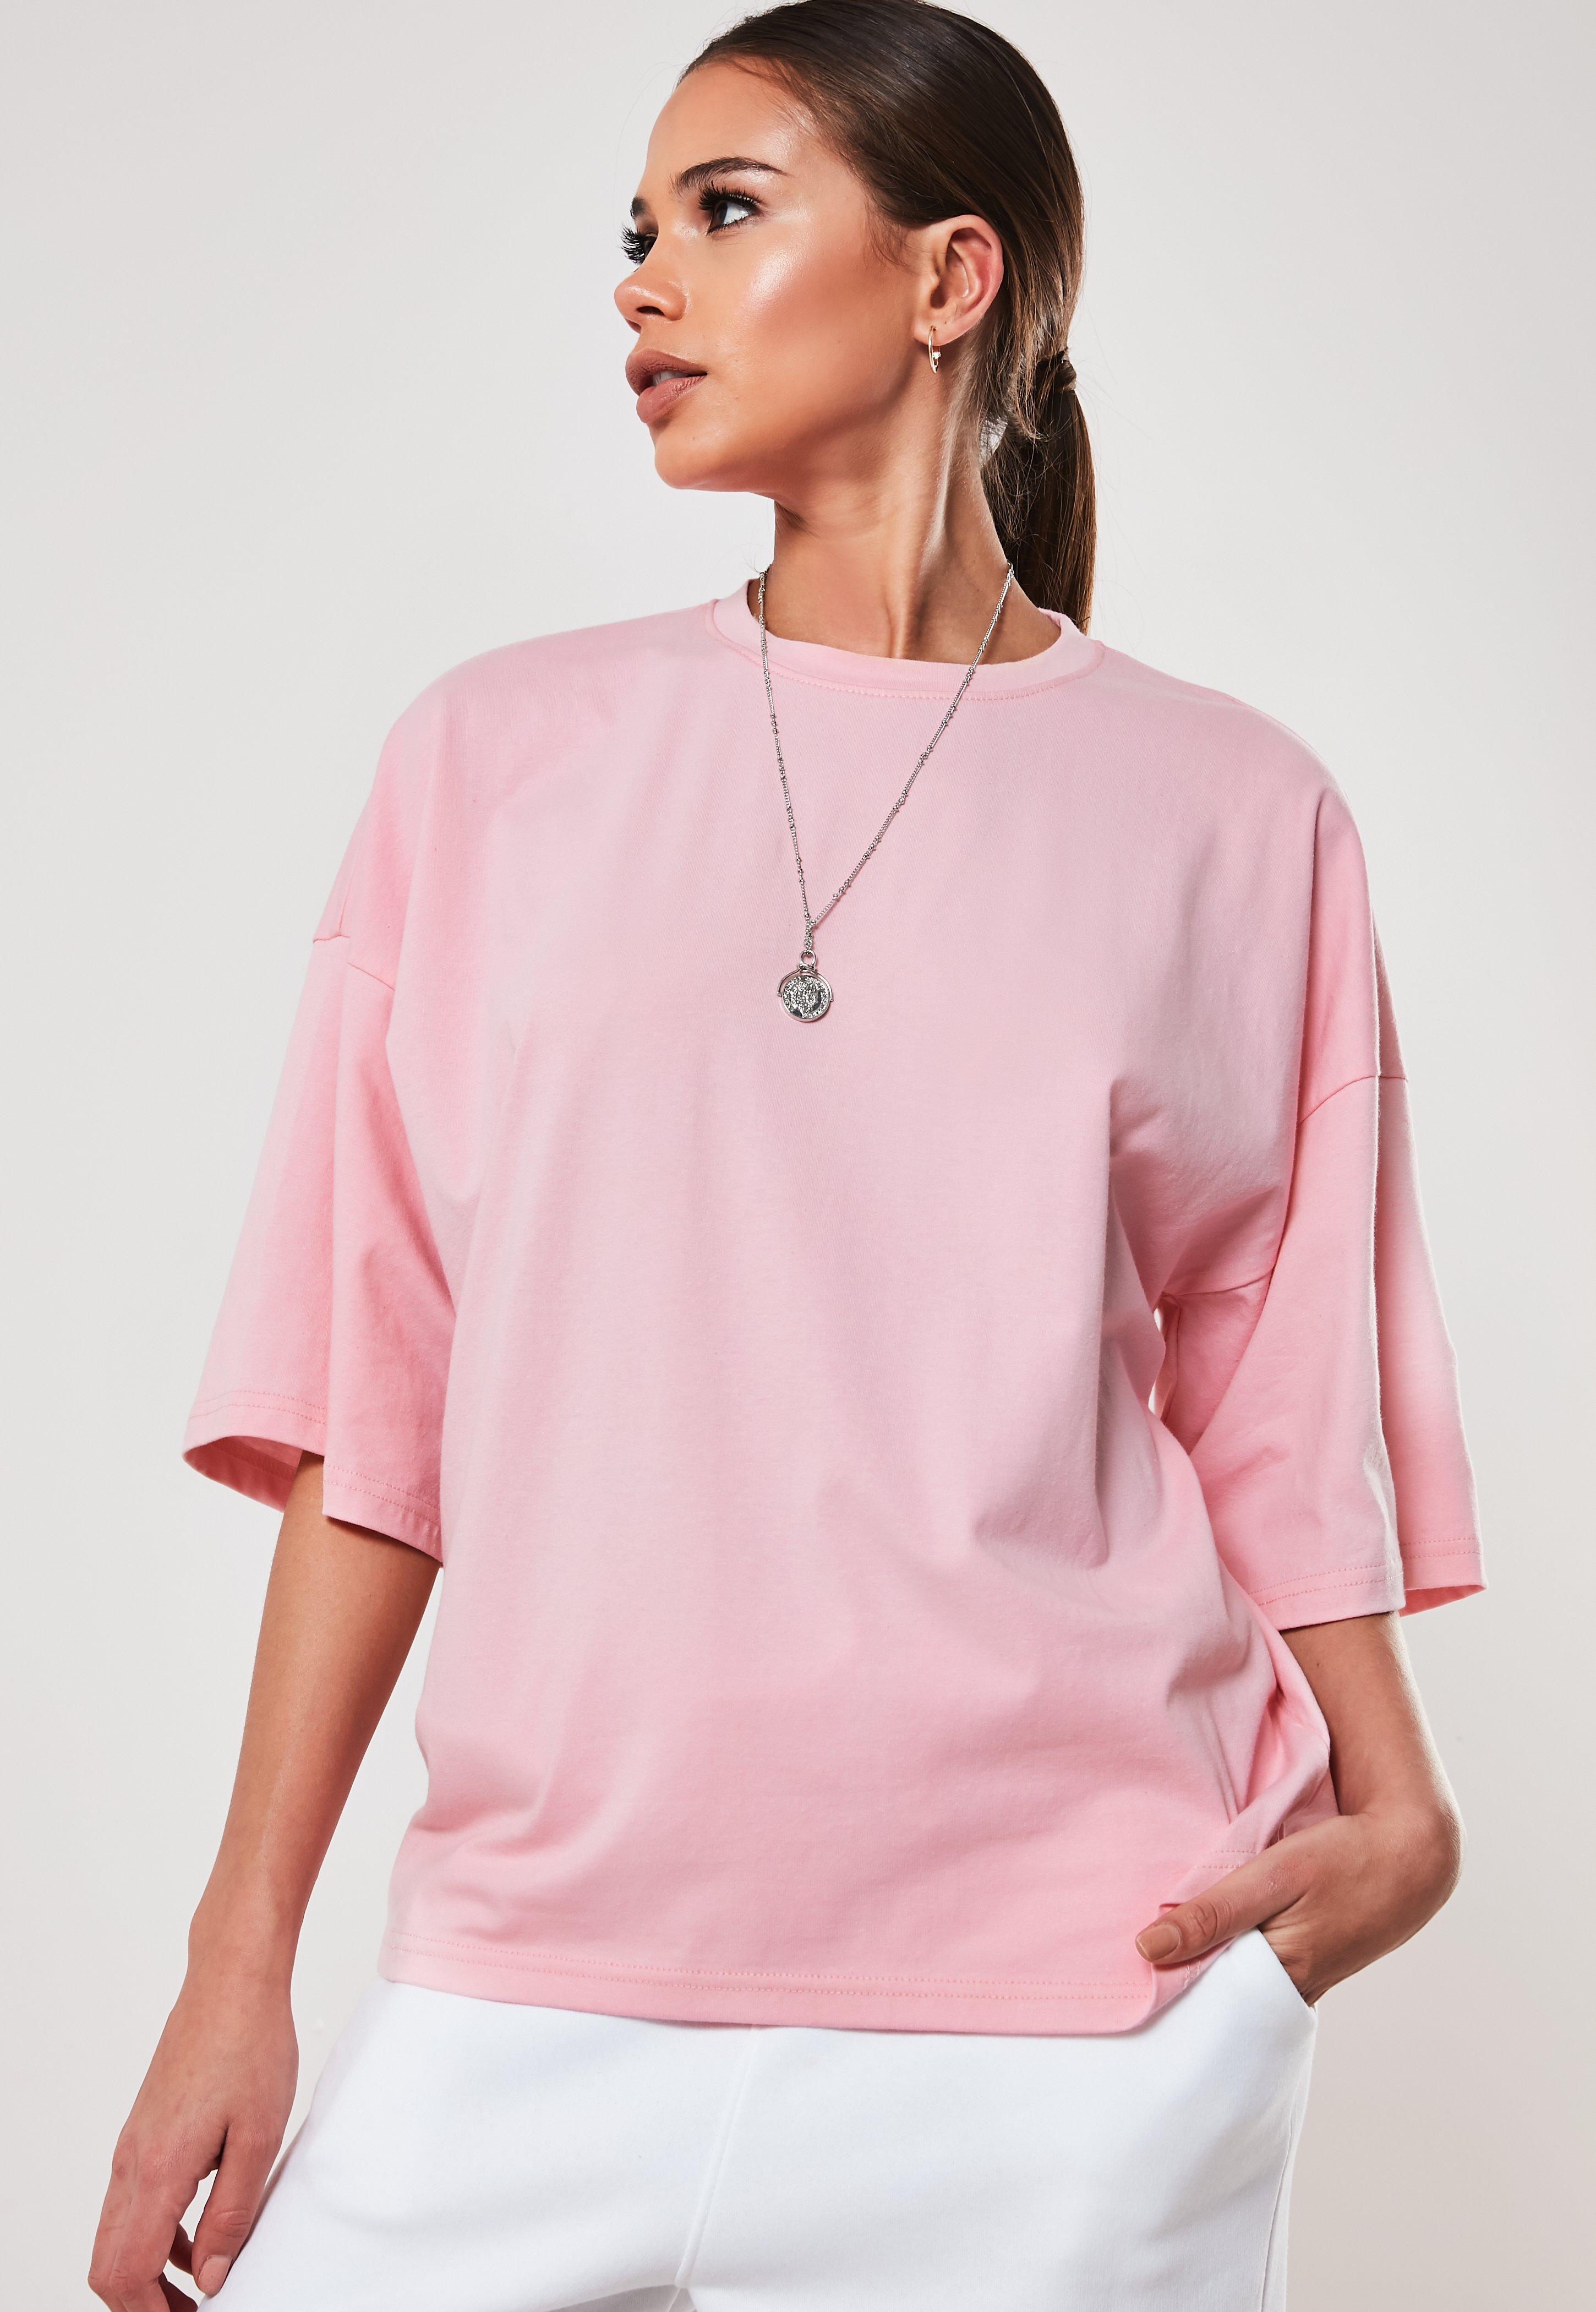 ffea481e5c59 T-Shirts & Women's Tees - Missguided